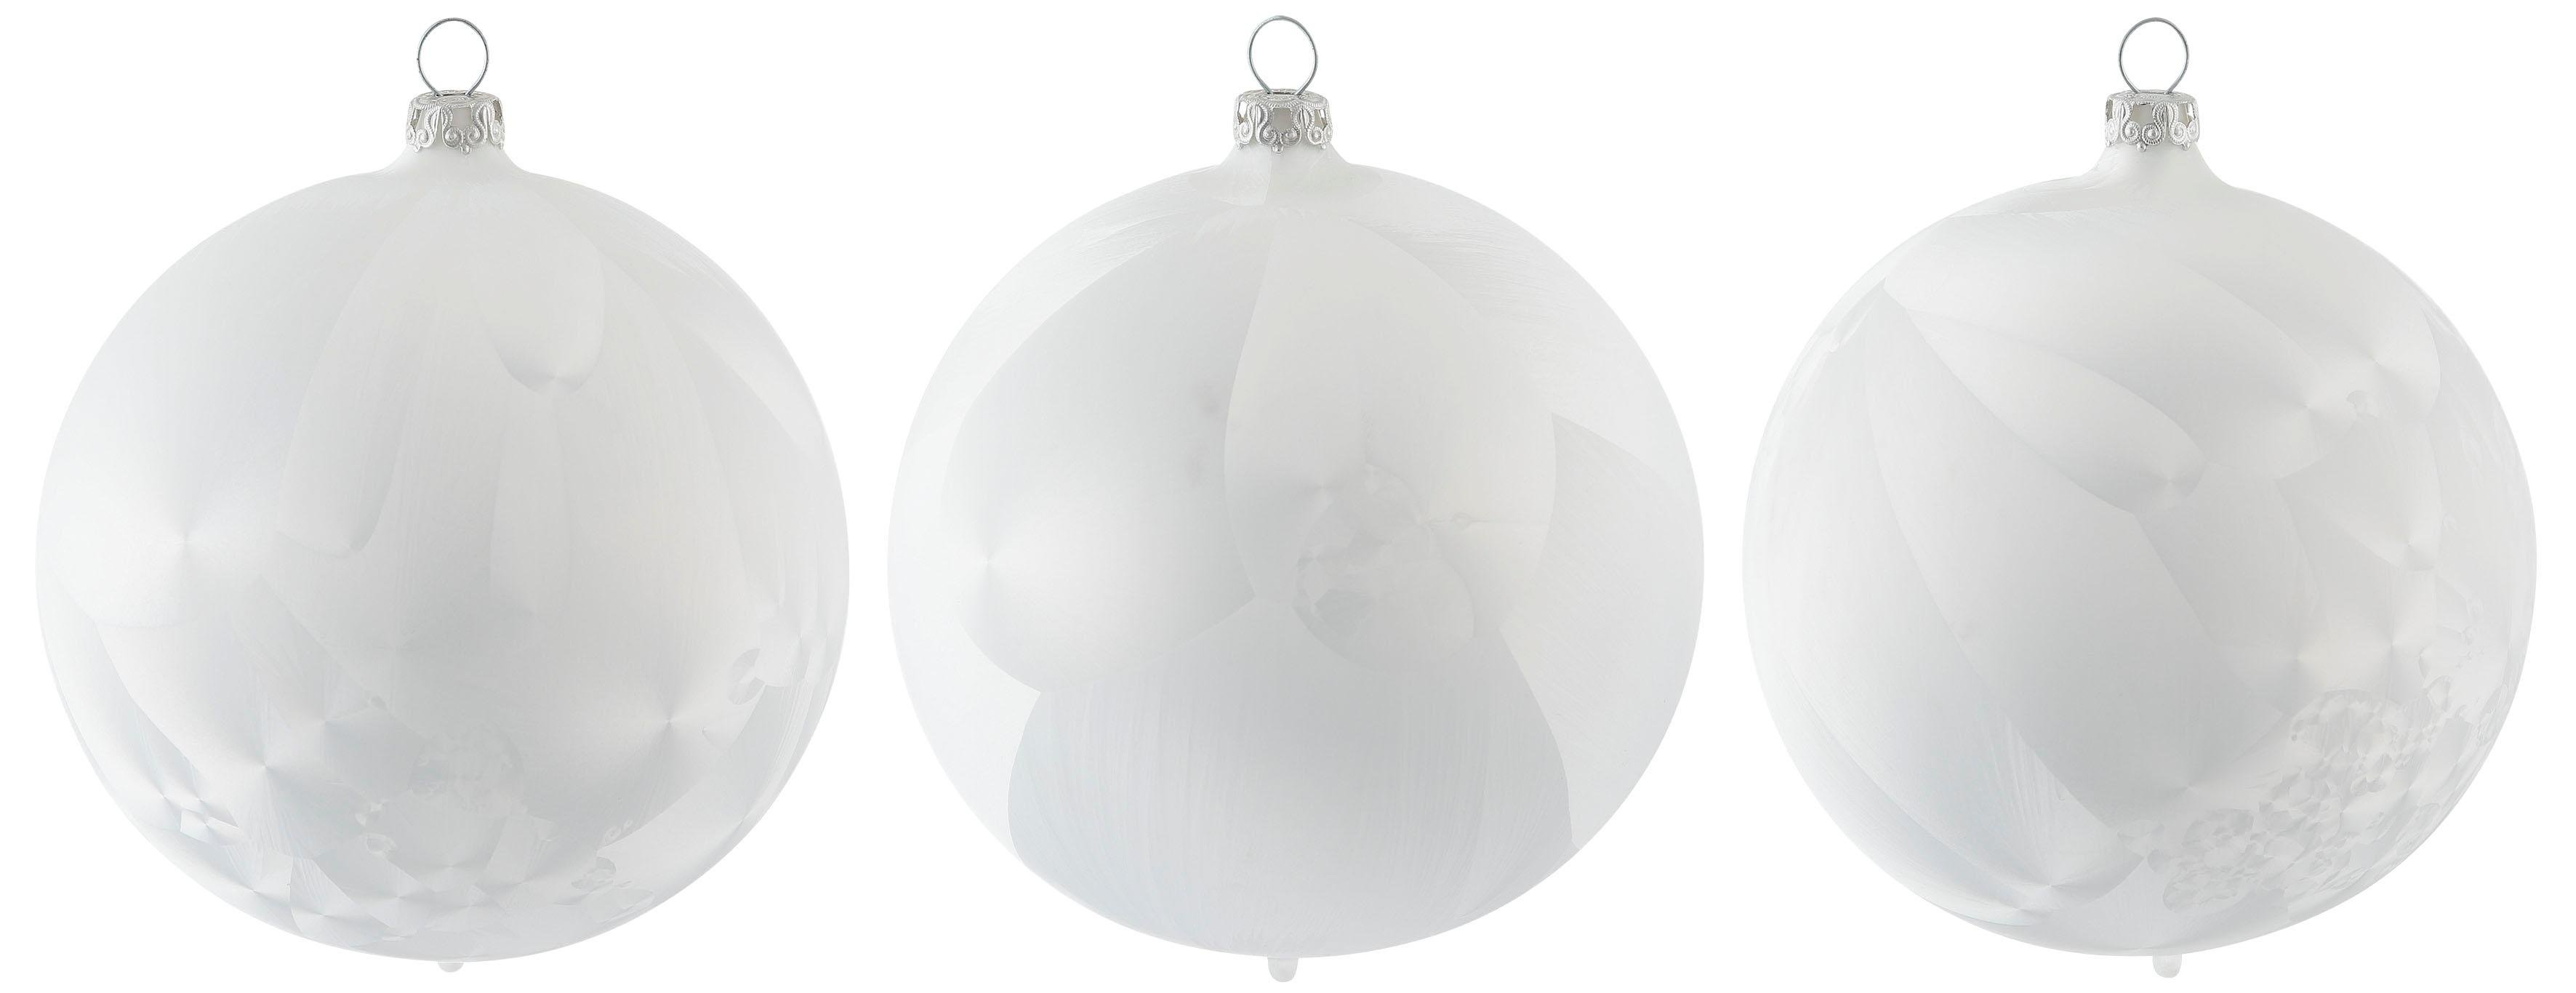 Thüringer Glasdesign kerstbal Lykka mondgeblazen, ø 10 cm (set, 3 stuks) goedkoop op otto.nl kopen